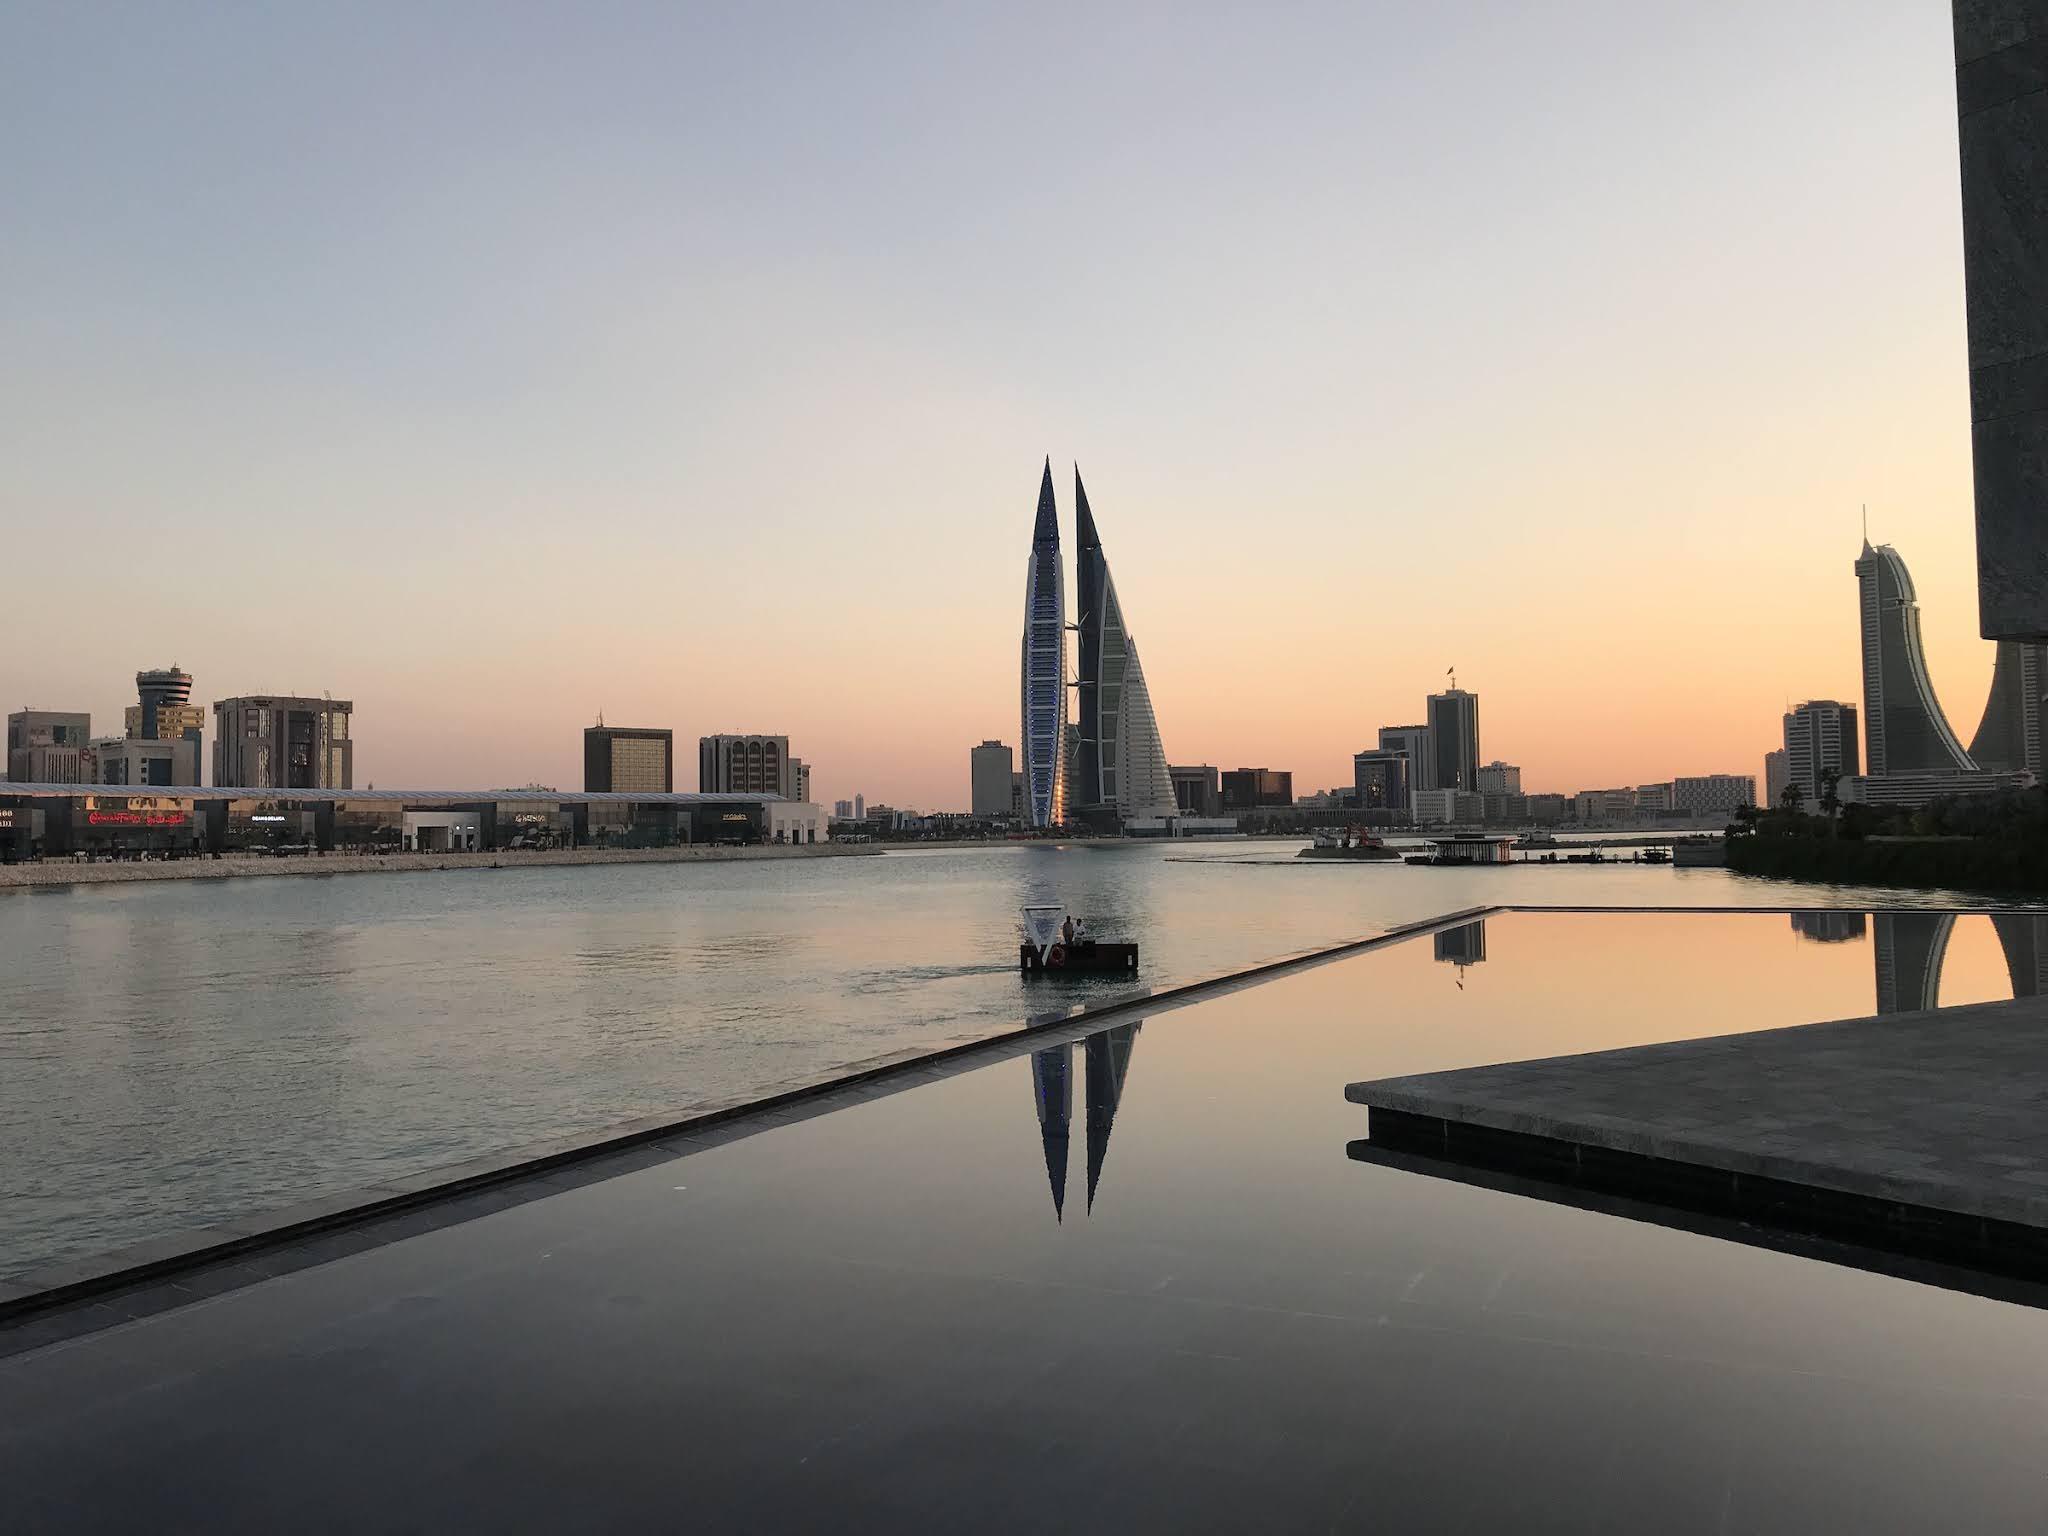 King Fahd Causeway set to reopen on May 17